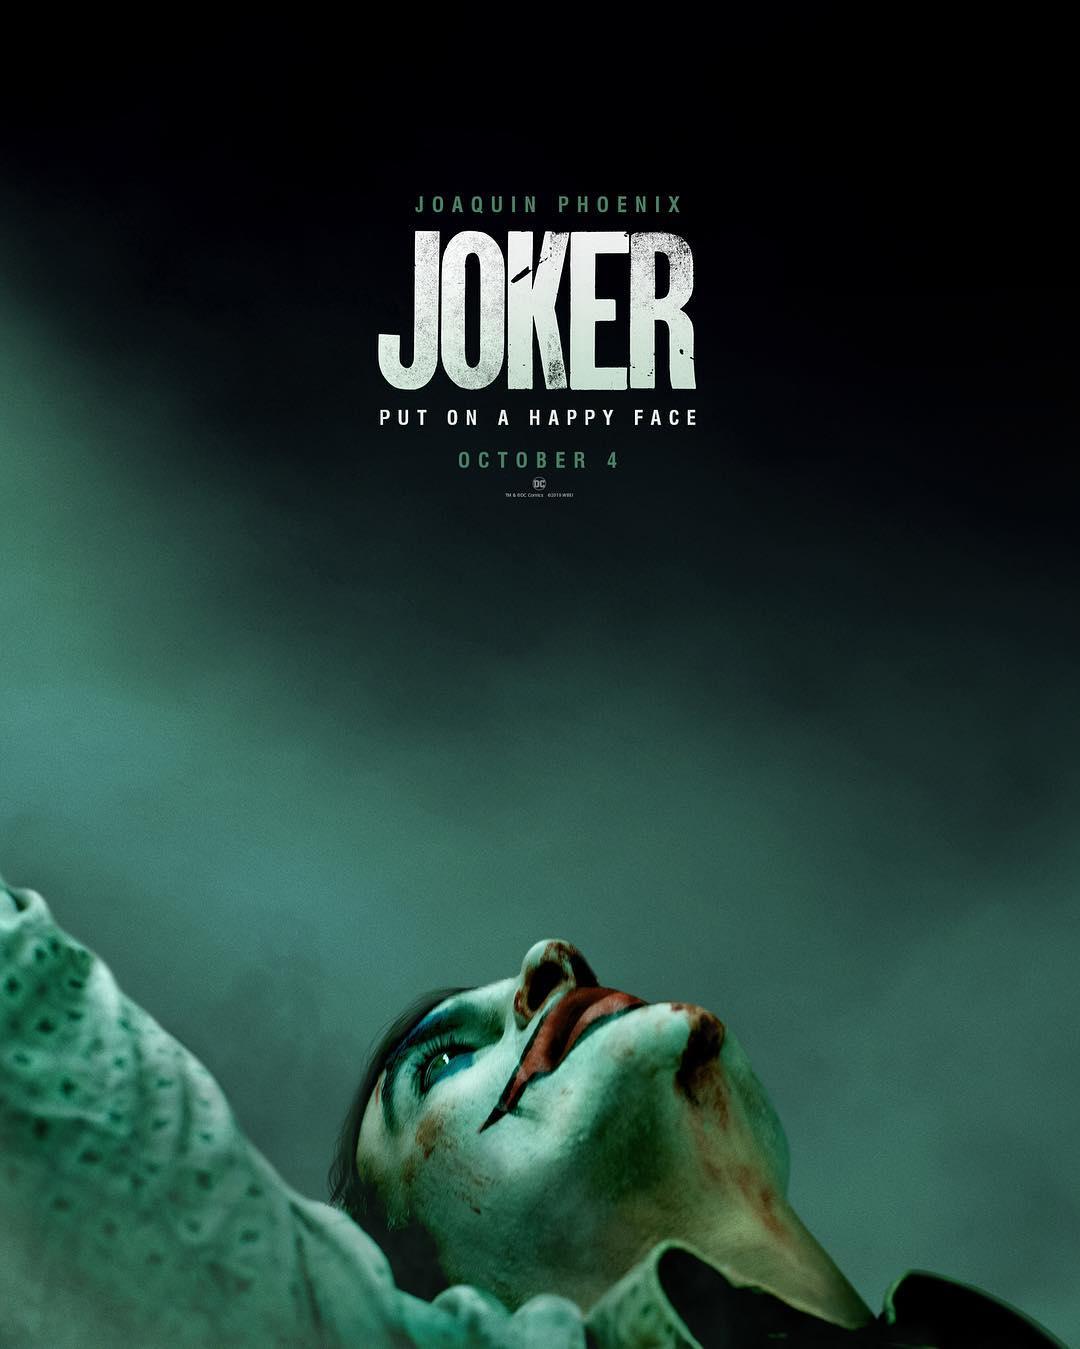 joker joaquin phoenix 2019 movie